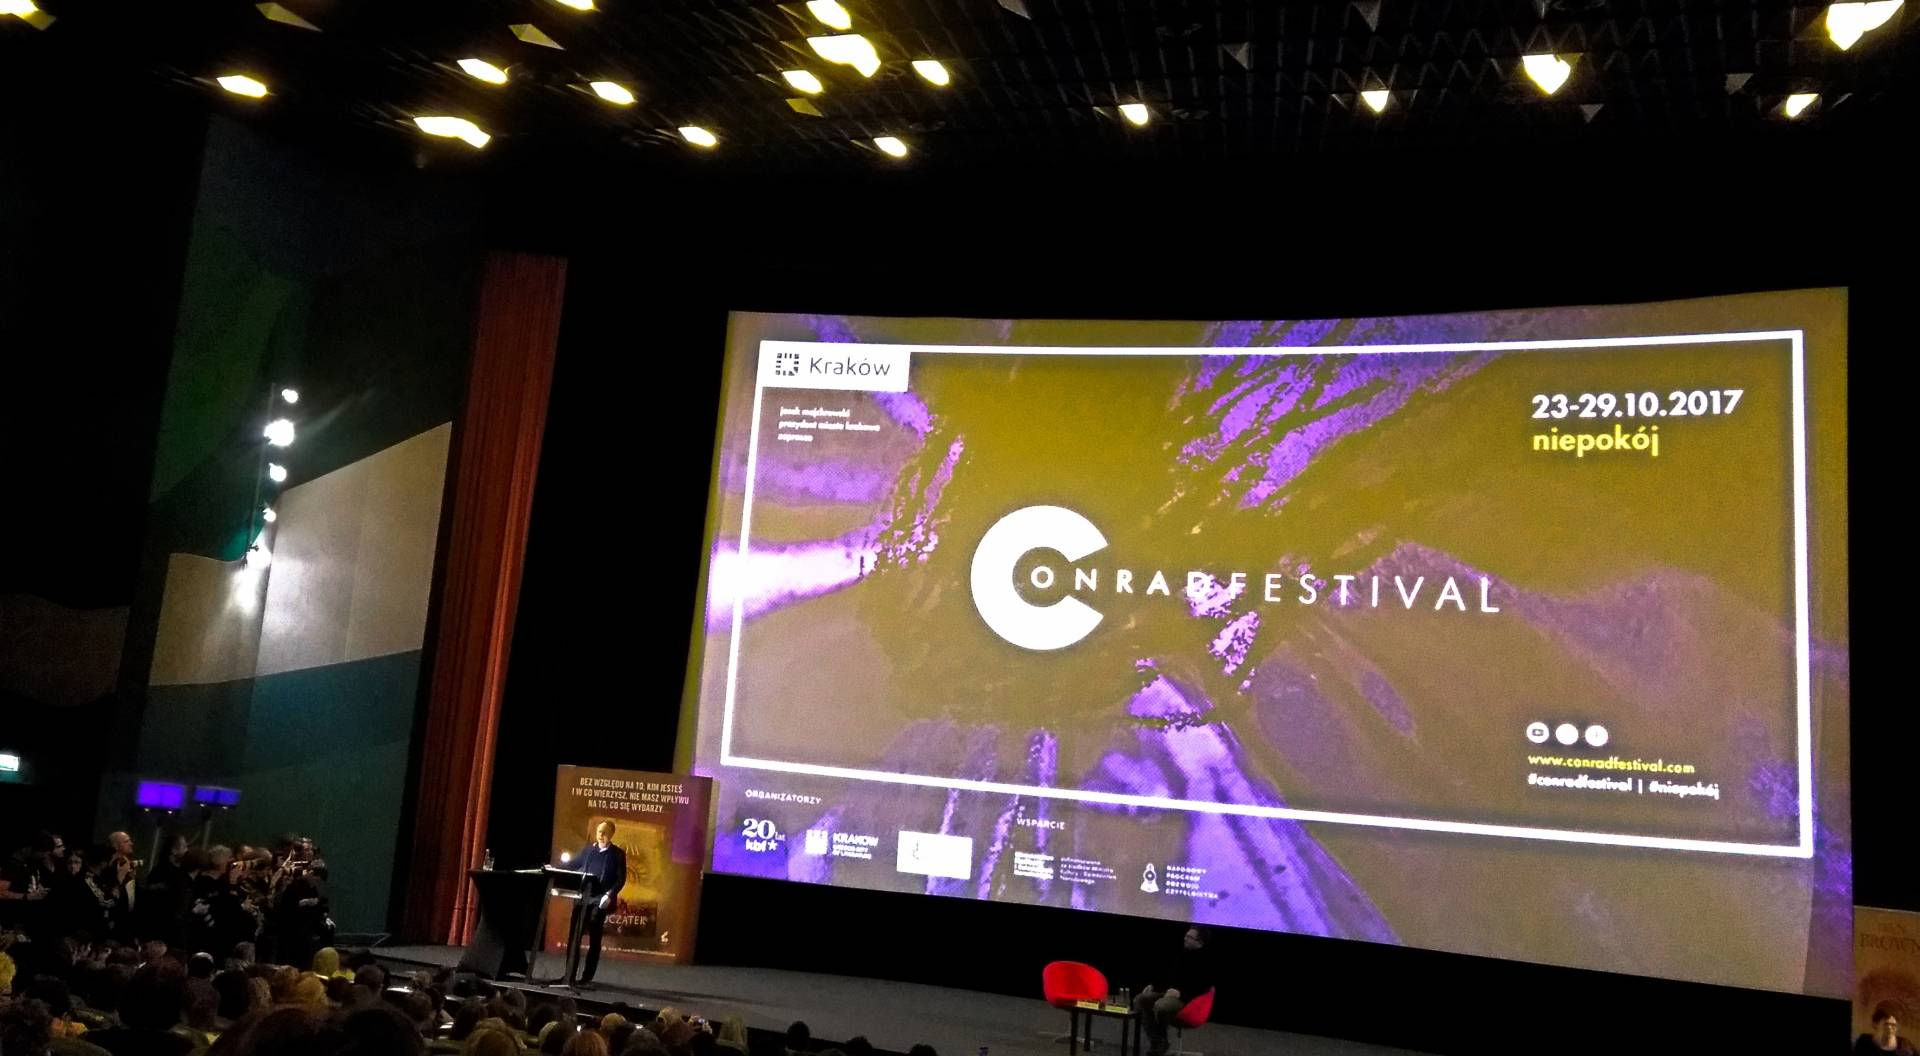 Festiwal Conrada 2017 i Targi Książki Kraków 2017 | RELACJA